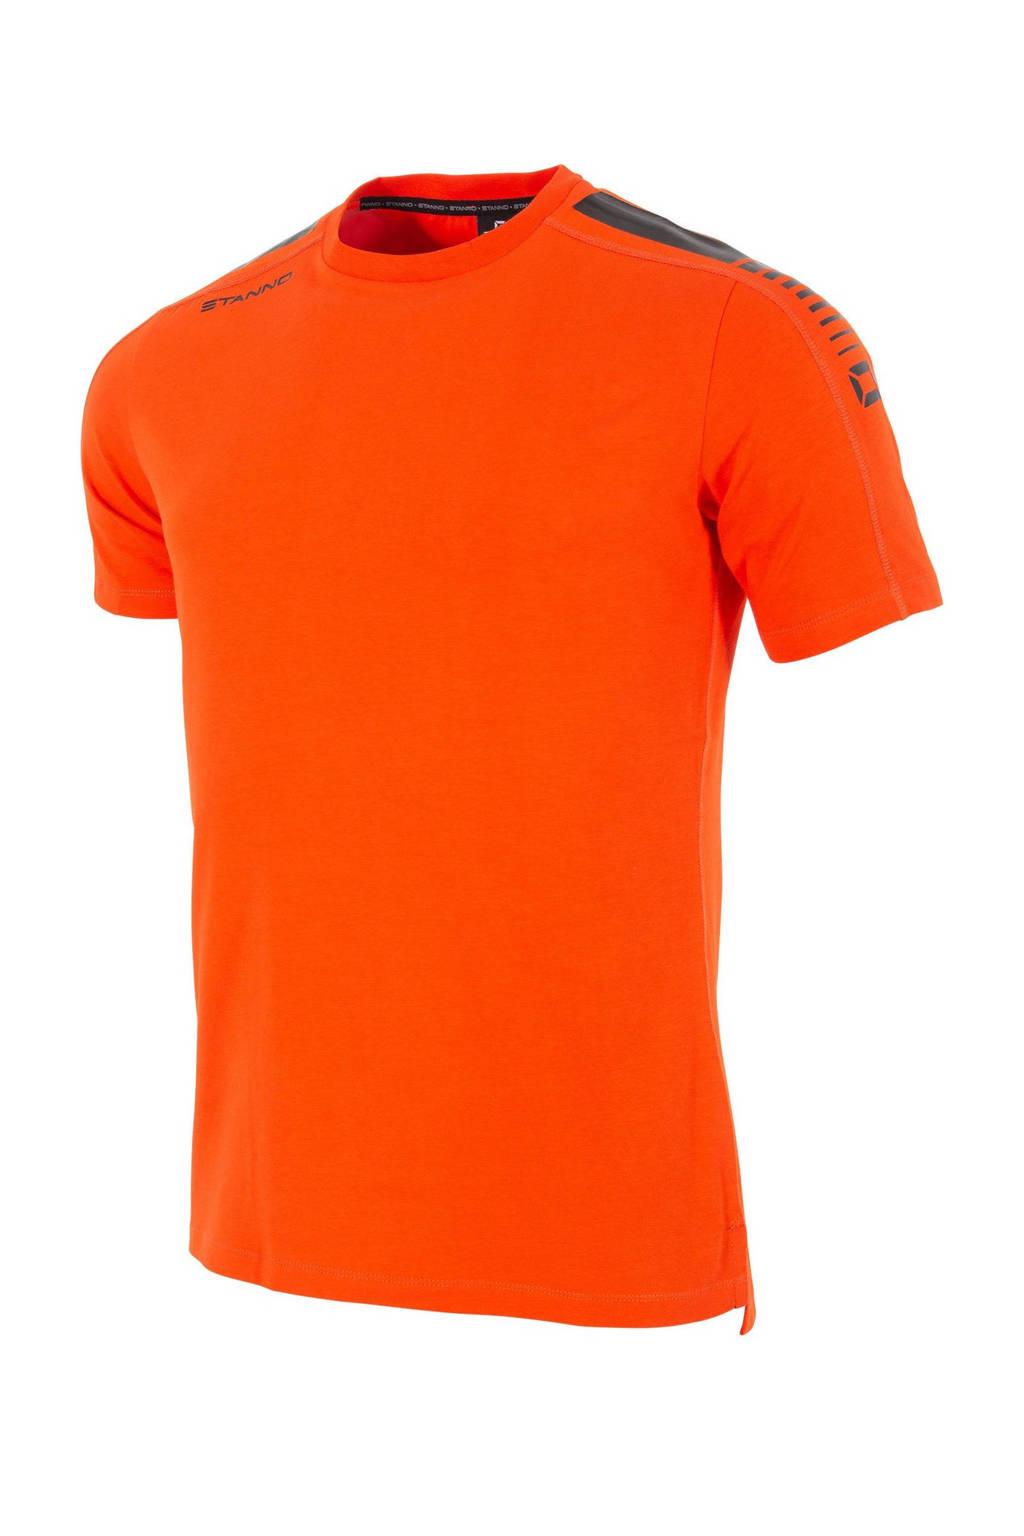 Stanno Senior  Sport T-shirt oranje, Oranje